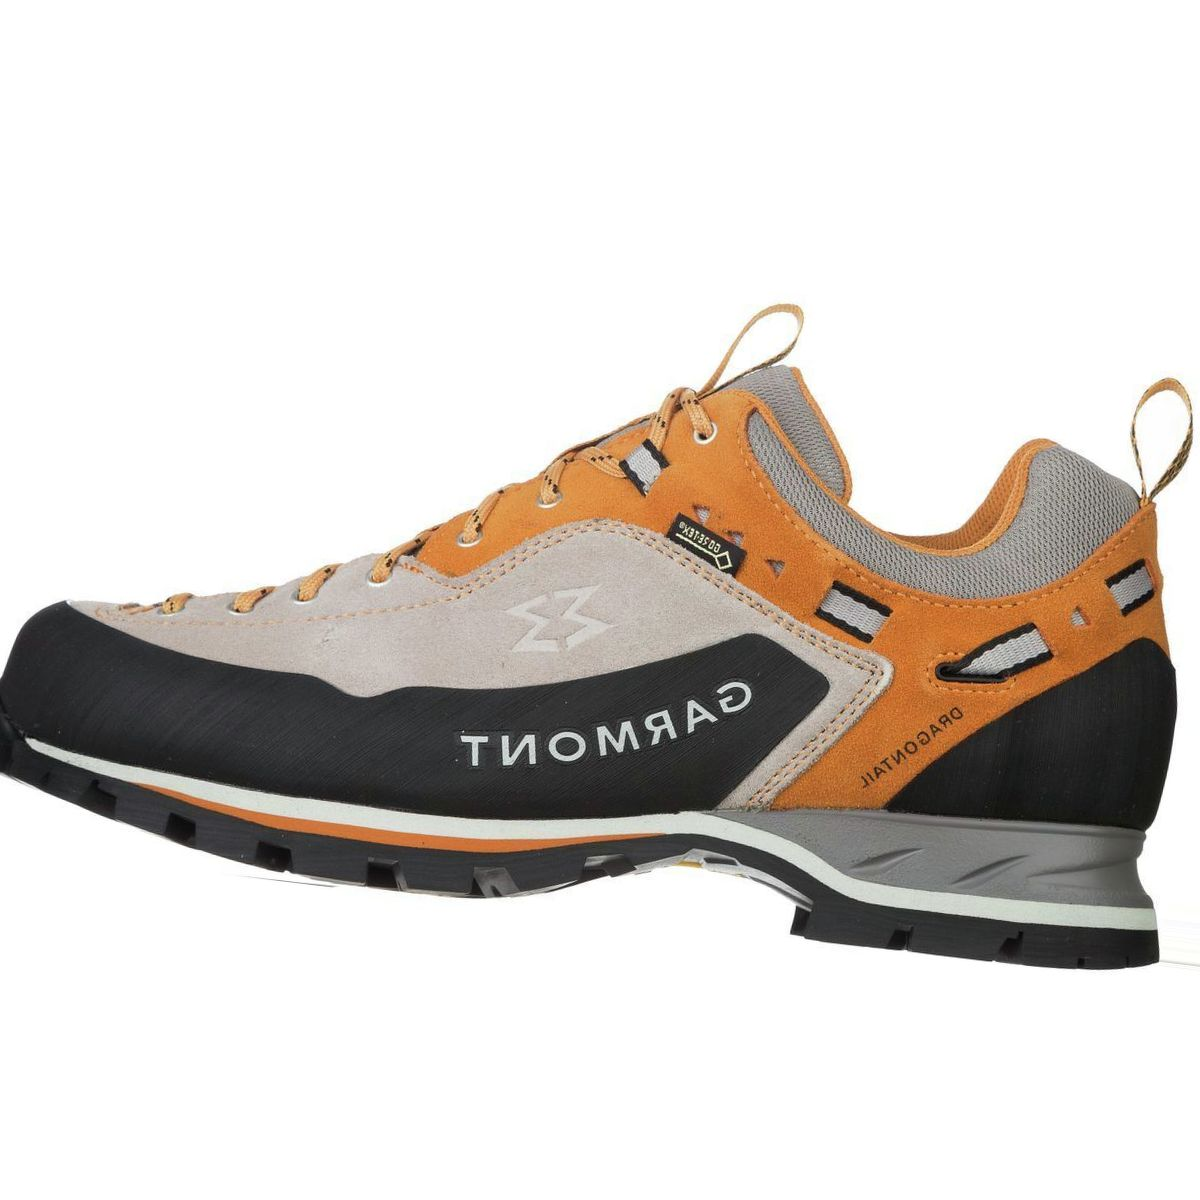 Garmont Dragontail MNT GTX Approach Shoe - Men's